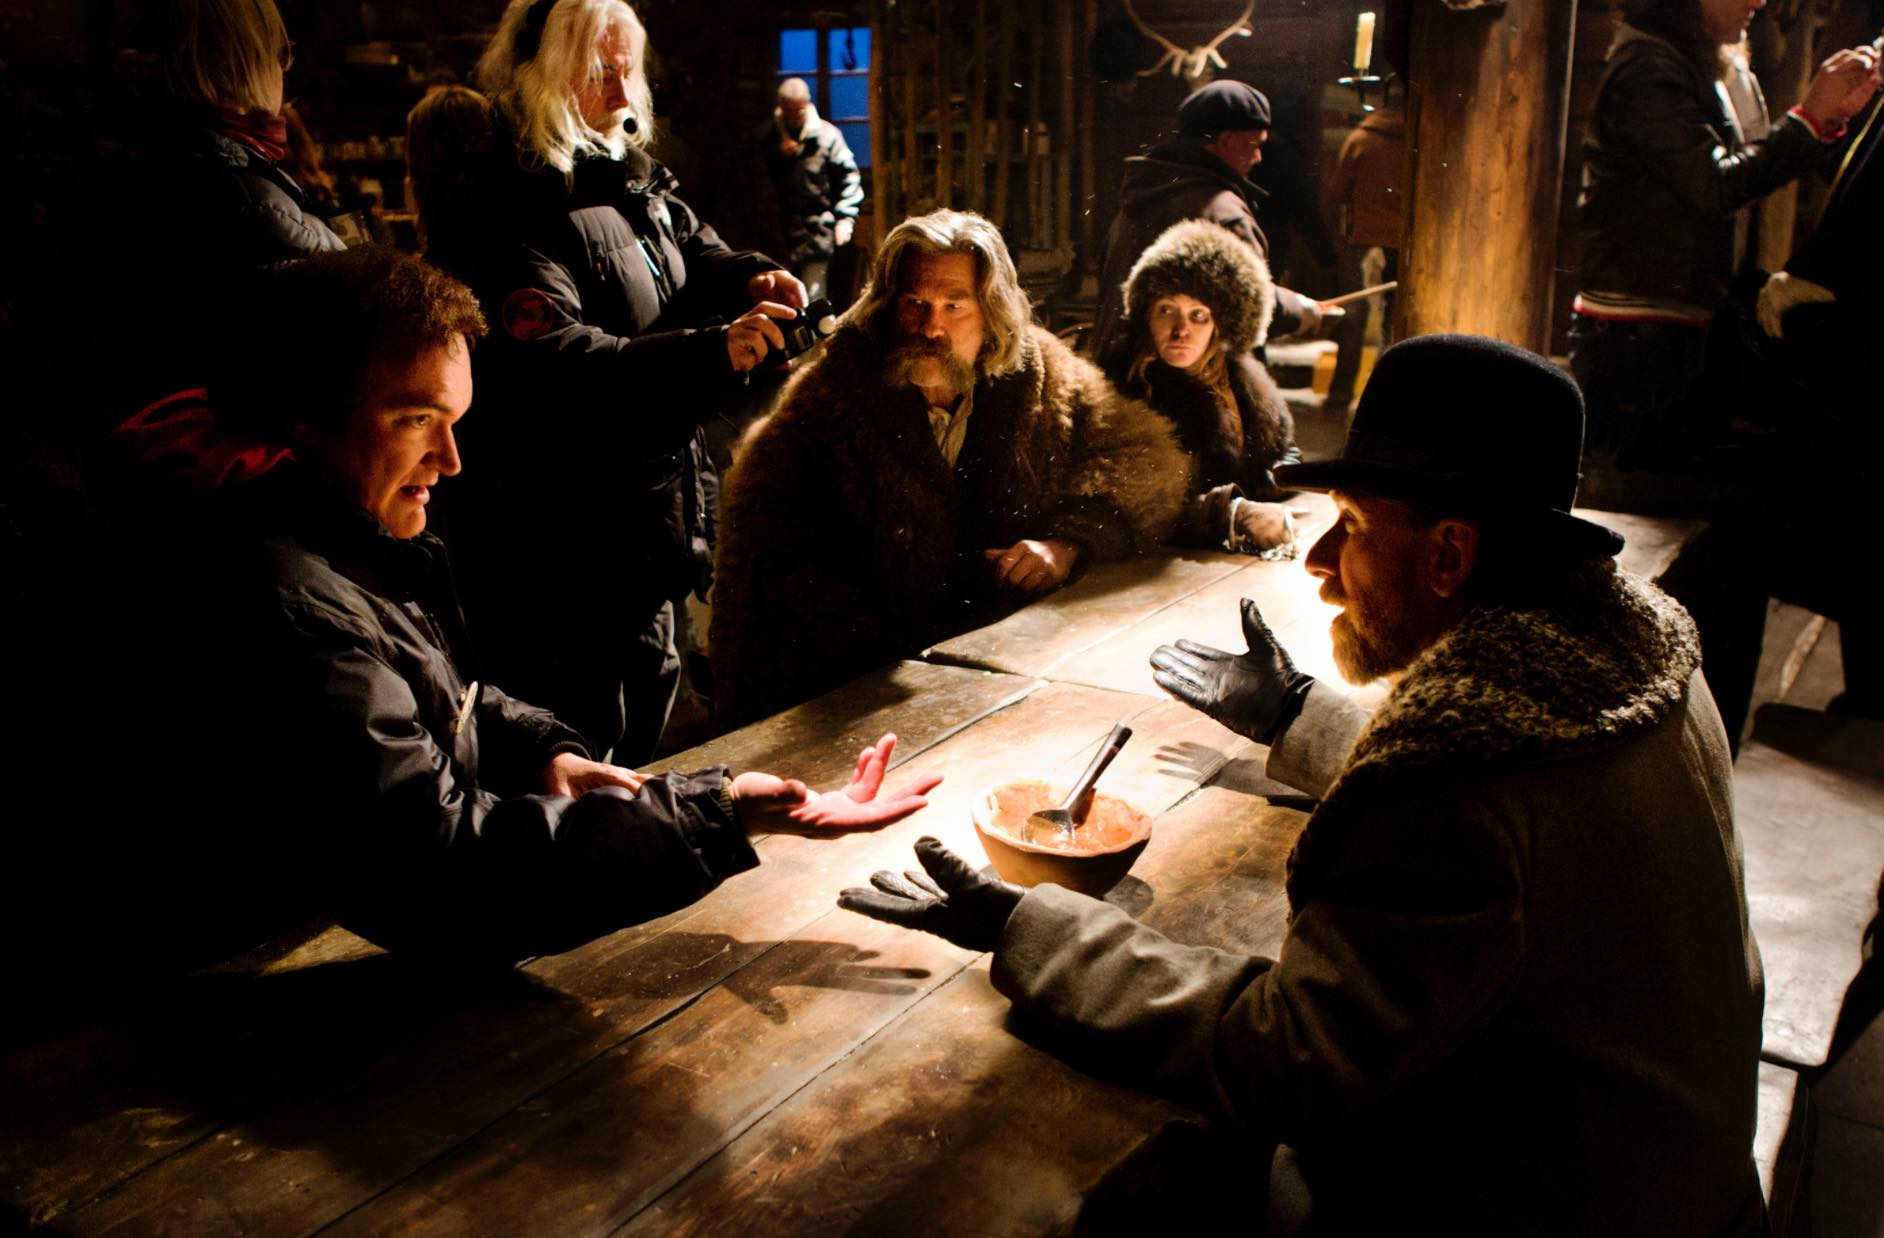 Quentin Tarantino, Kurt Russelll, Tim Roth and Jennifer Jason Leigh on the set of The Hateful Eight